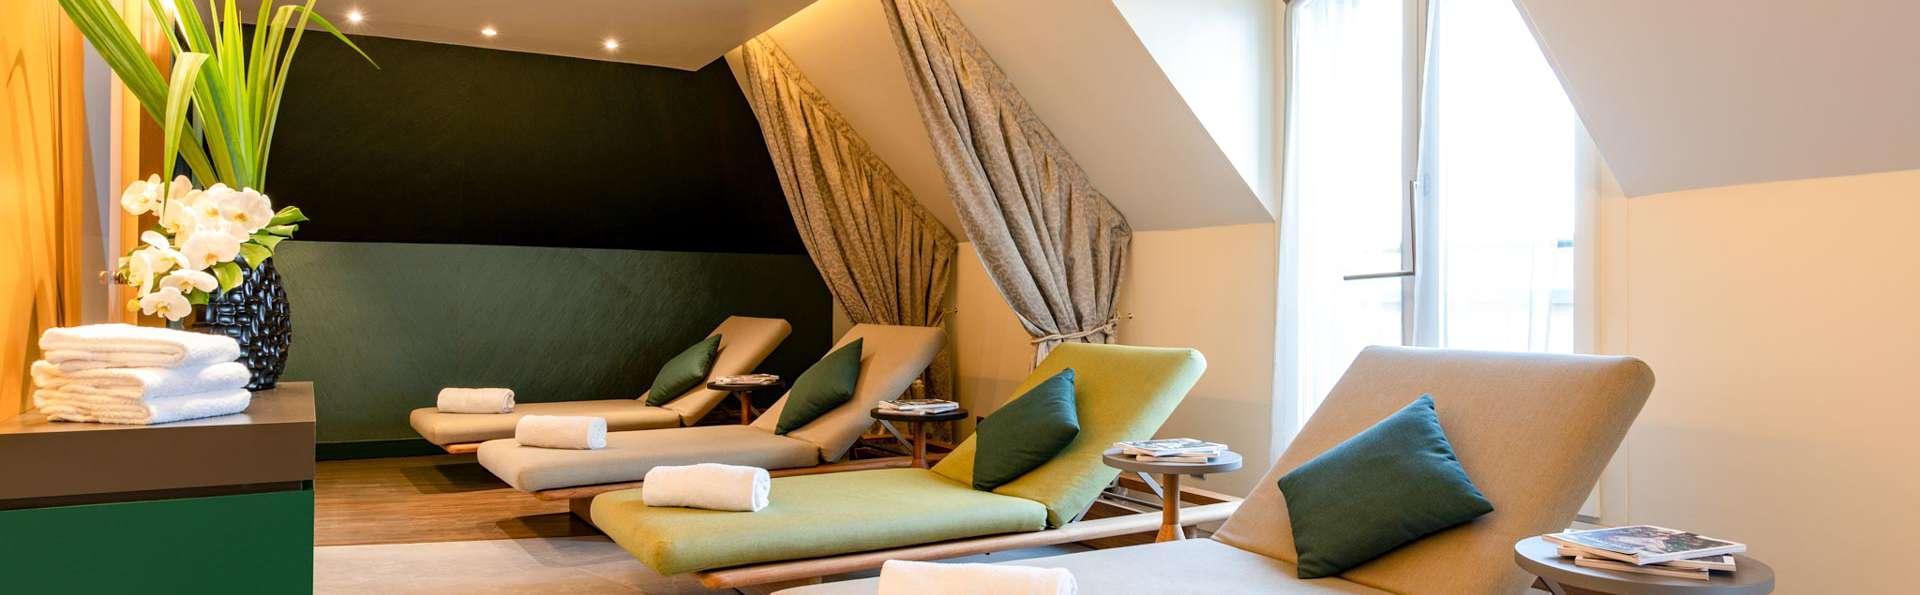 Hotel Le Louis, Versailles Château - MGallery - EDIT_N2_SPA_02.jpg